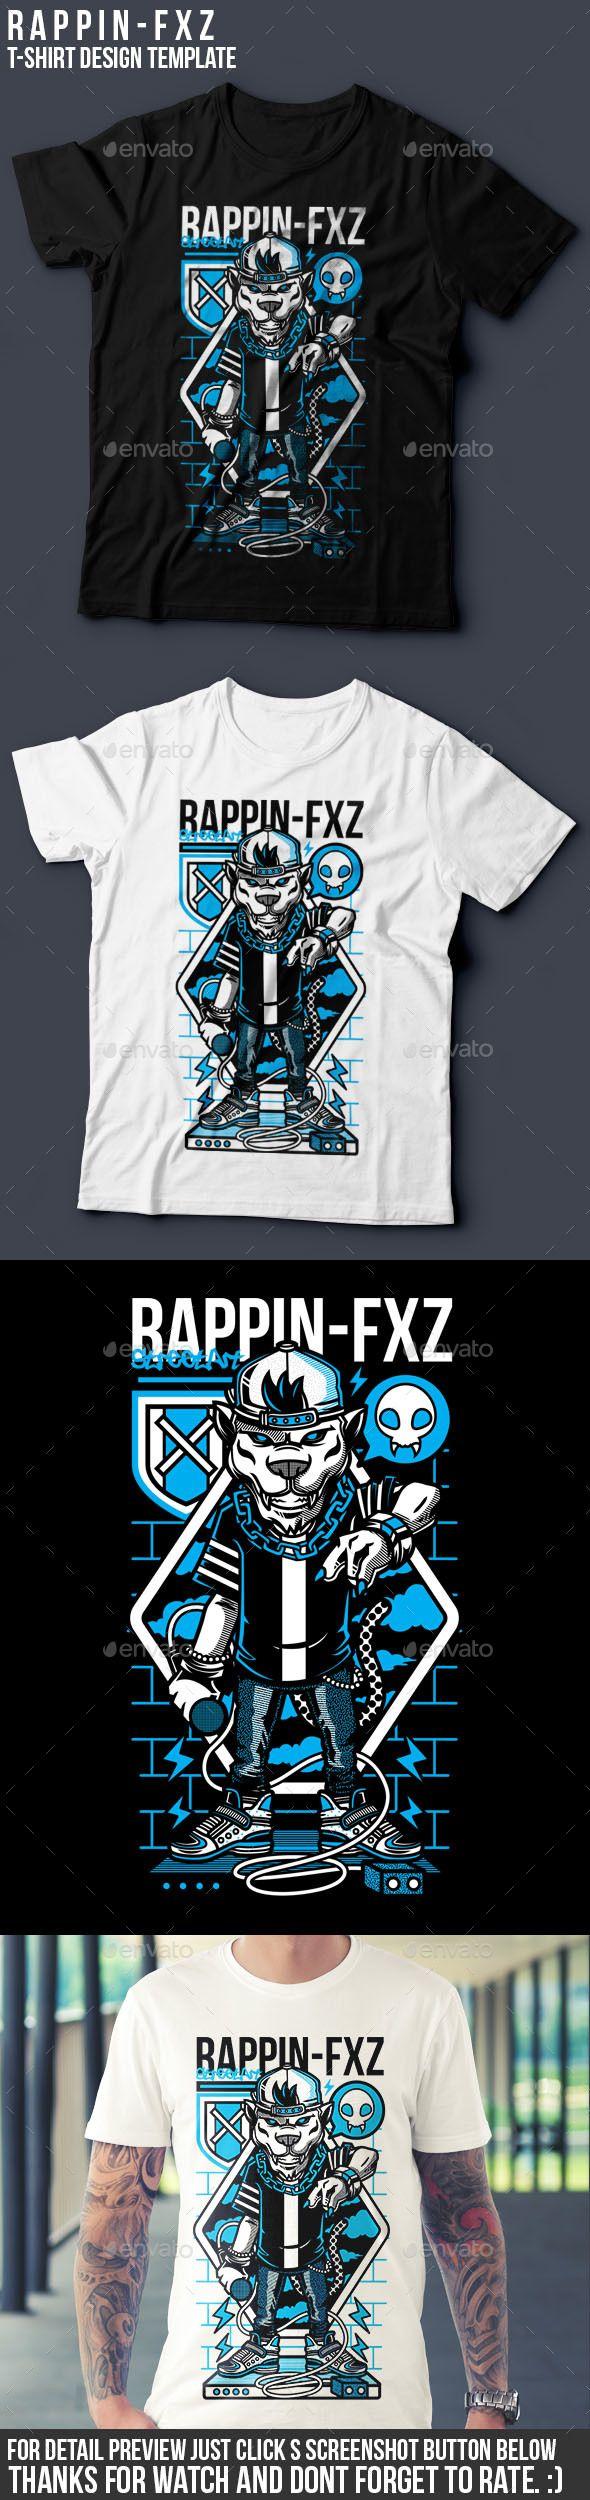 Shirt design resolution - Rappin Fxz T Shirt Design Rapper Rapmusic Hiphop Jaguar